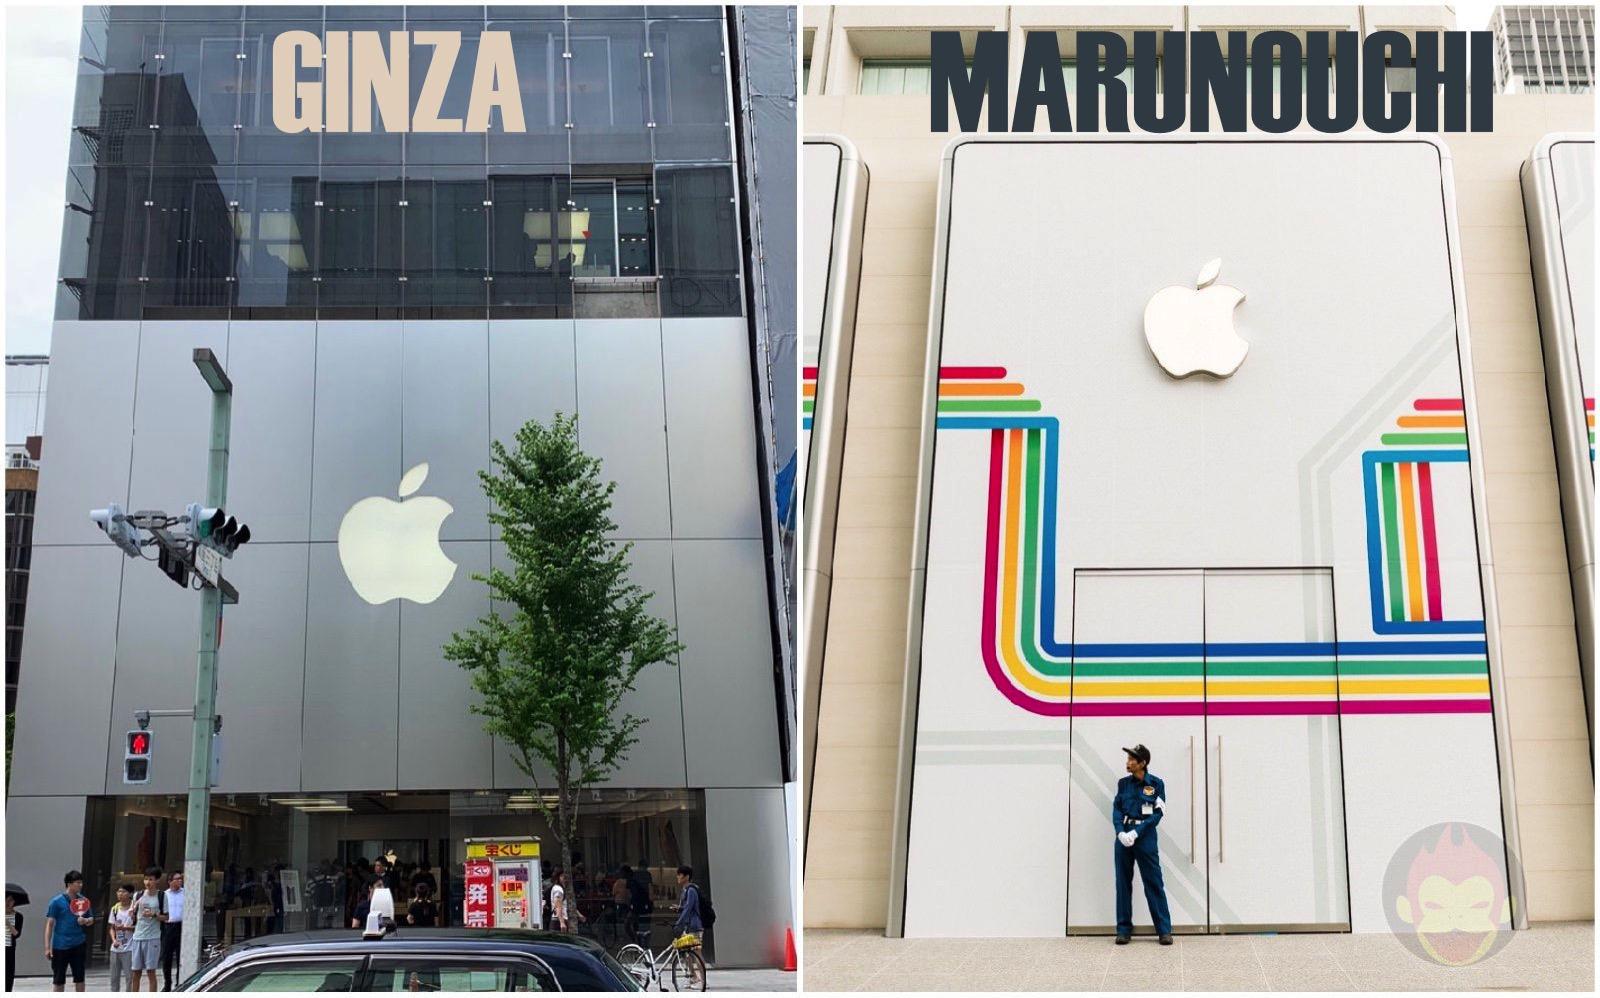 A Walk to Ginza to Marunouchi